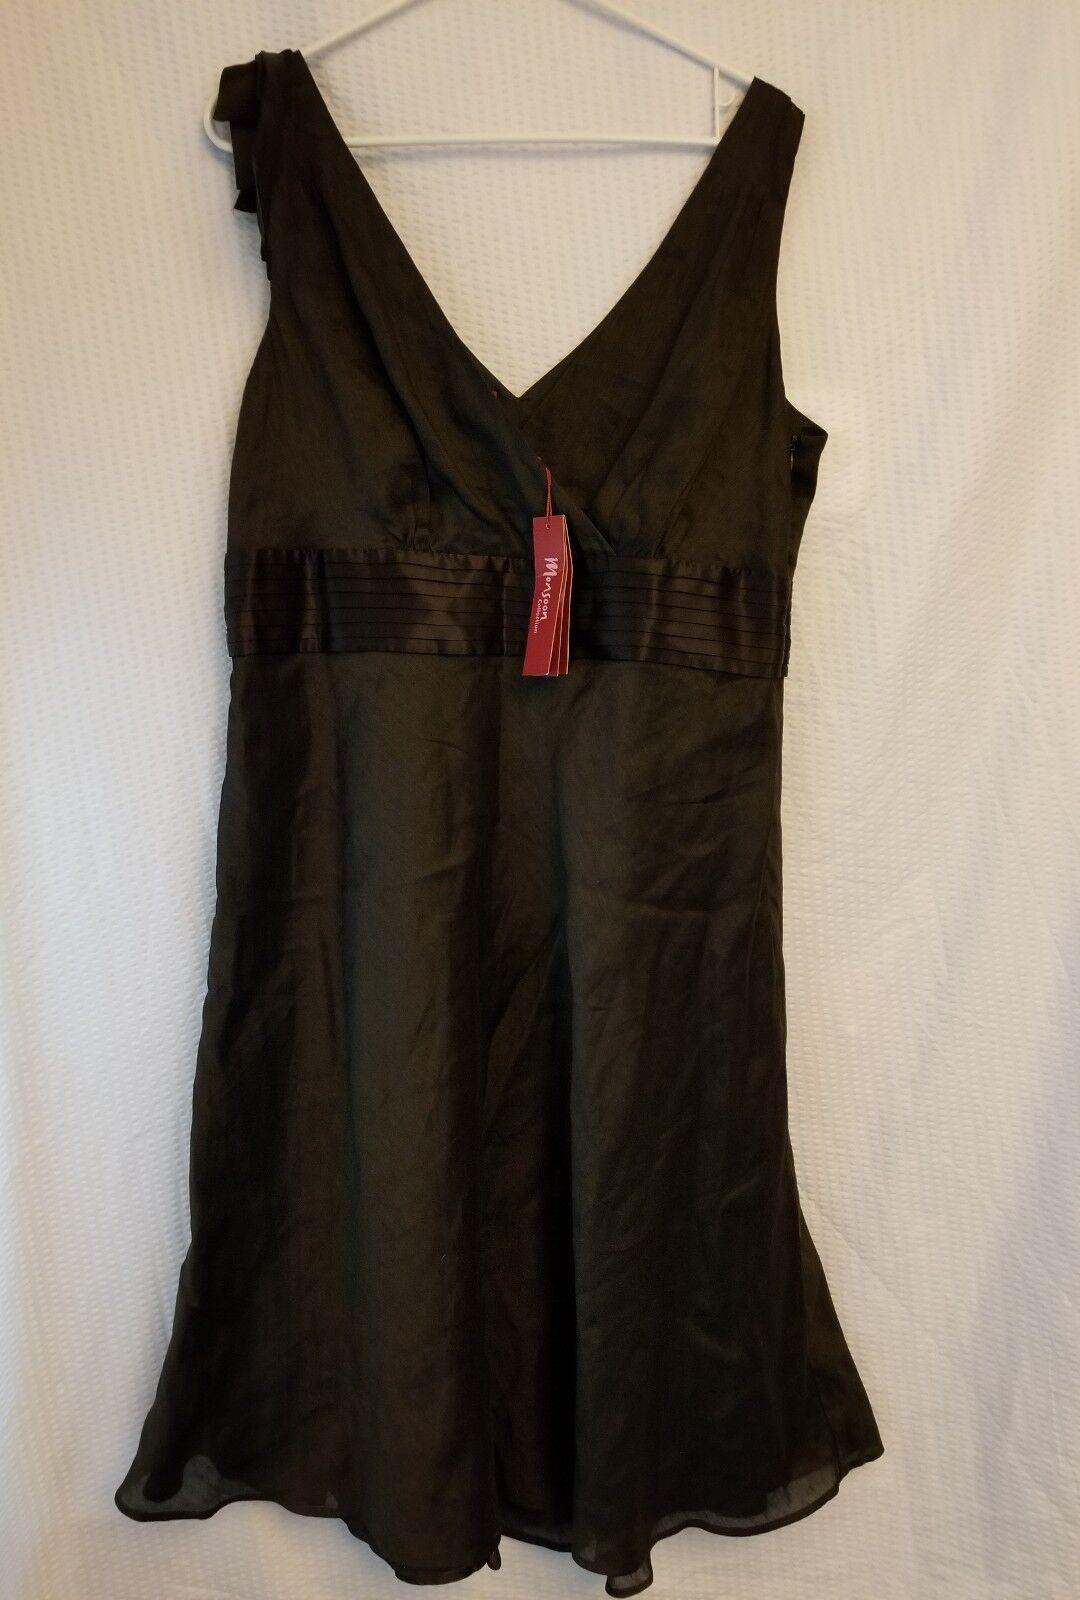 Women's Monsoon Black Silk Linen Blend Dress See Description For Size NWT